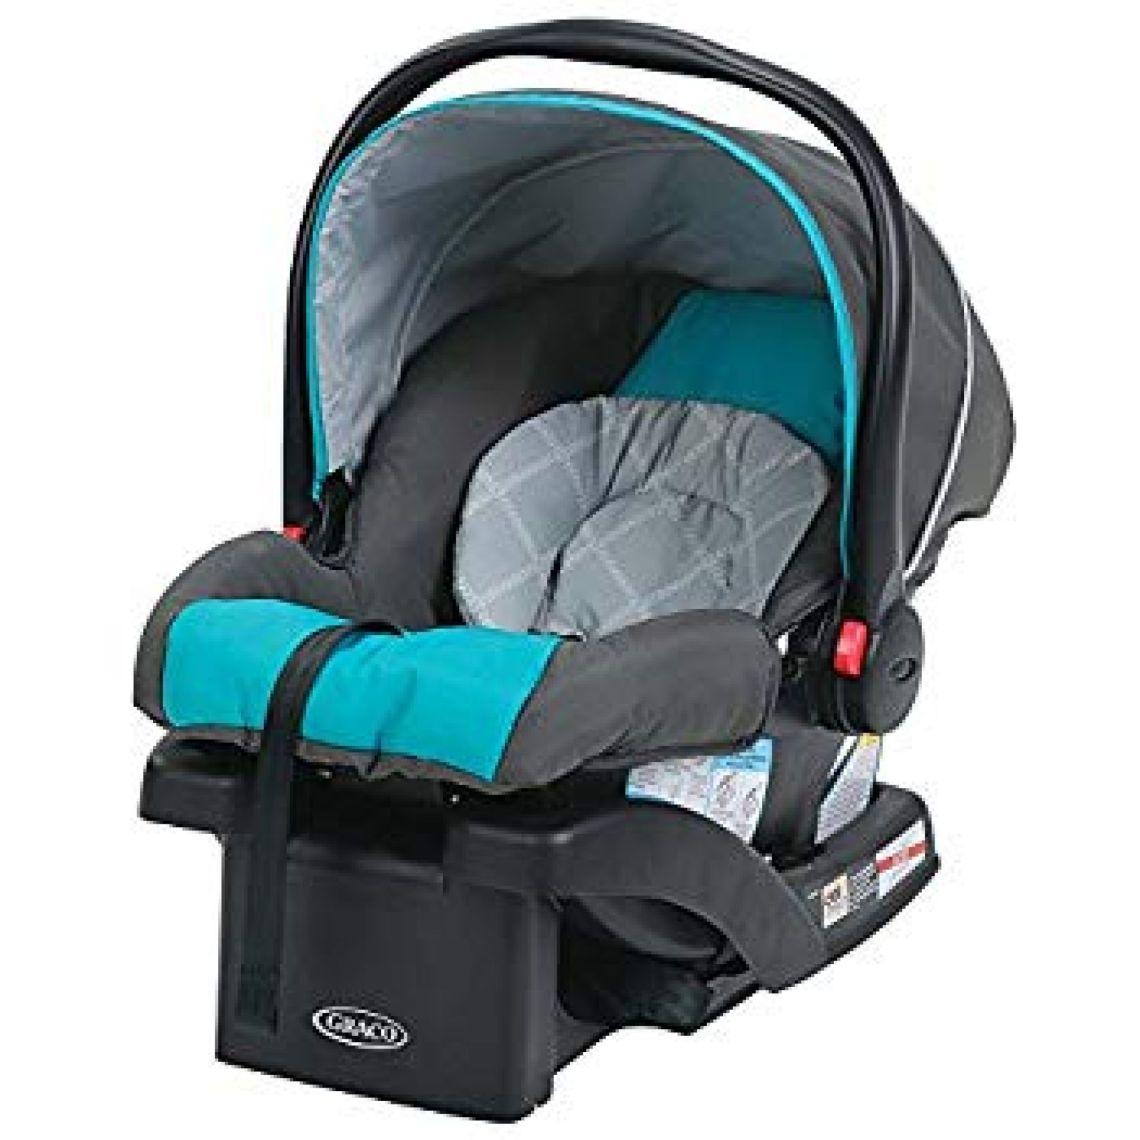 Amazon.com : Safety 1st onBoard 35 LT Infant Car Seat, Juniper Pop : Baby